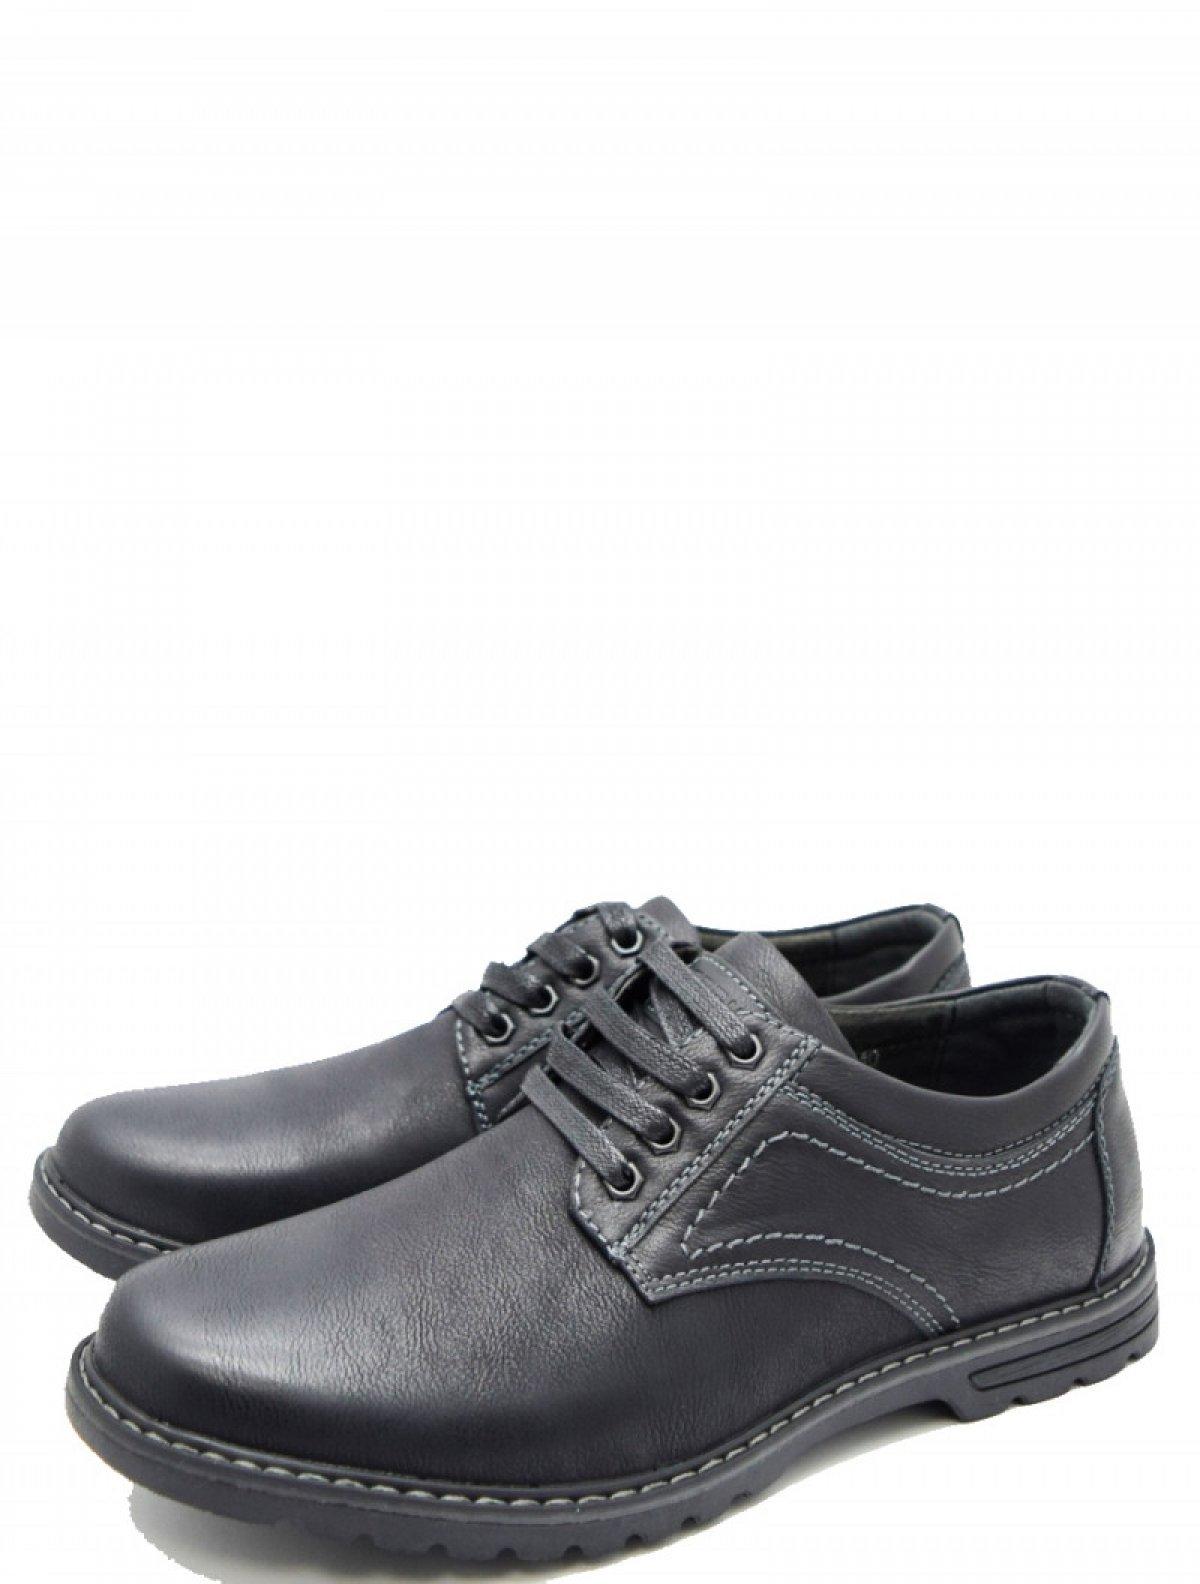 Carido 601-6E мужские туфли